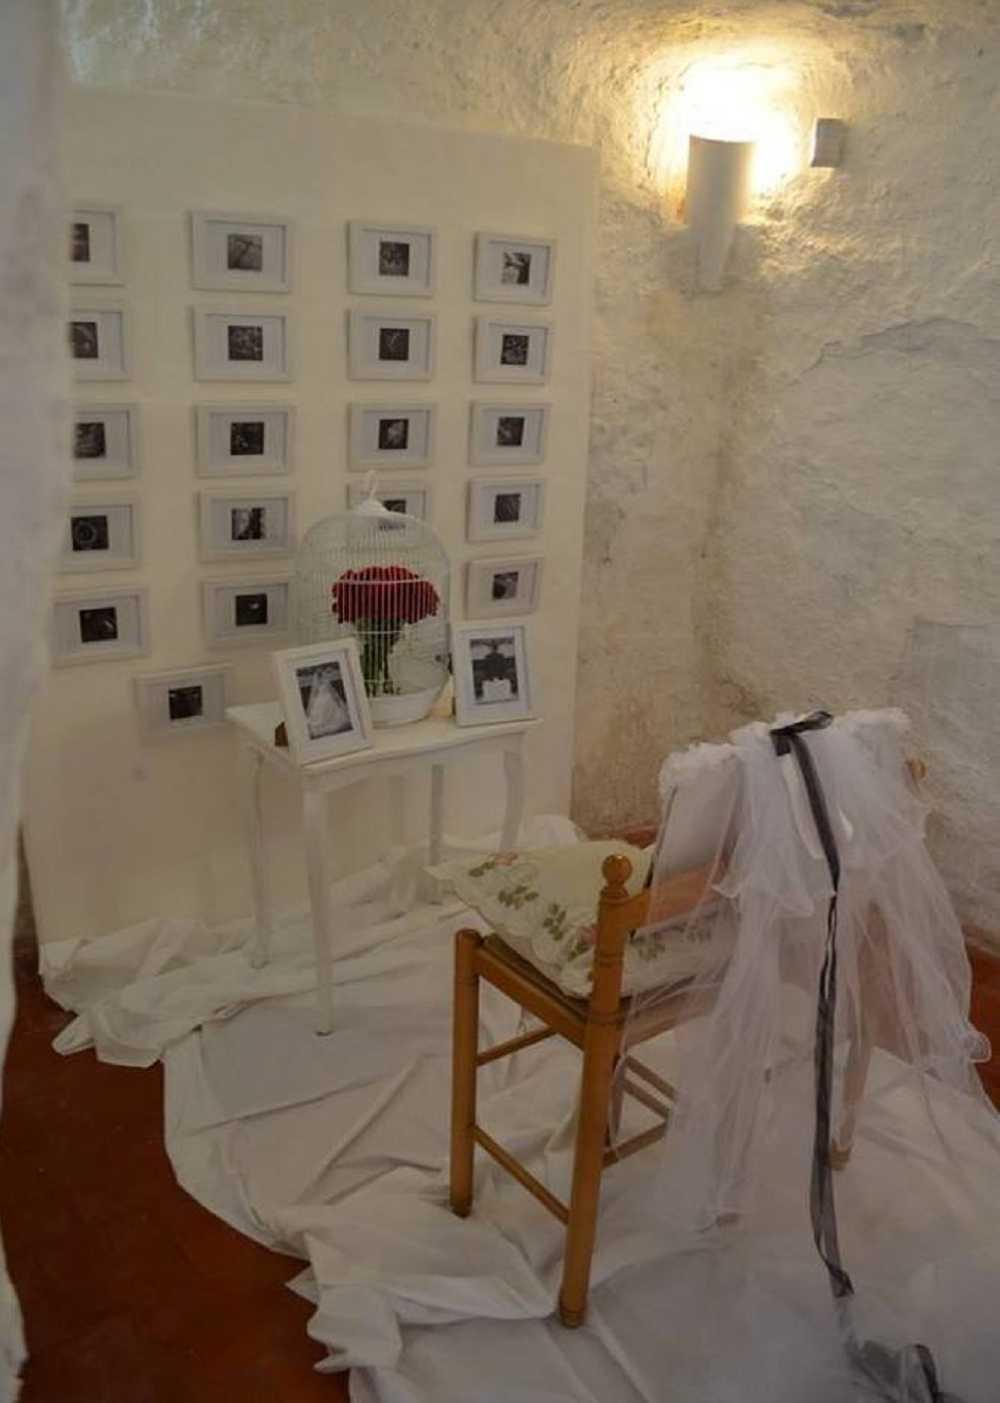 La boda paralela. fotografías. Gertrudis Rivalta Oliva